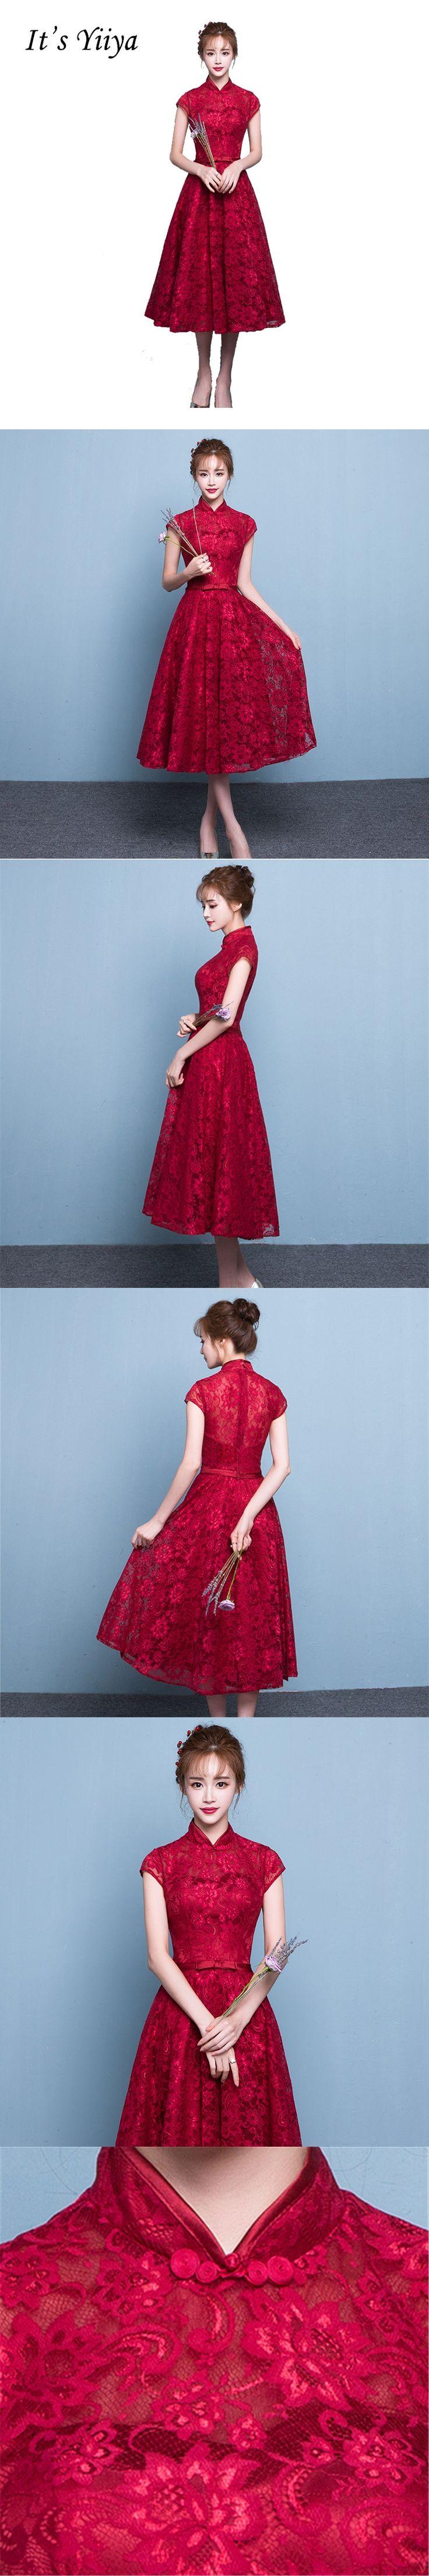 330 best Prom Dresses images on Pinterest